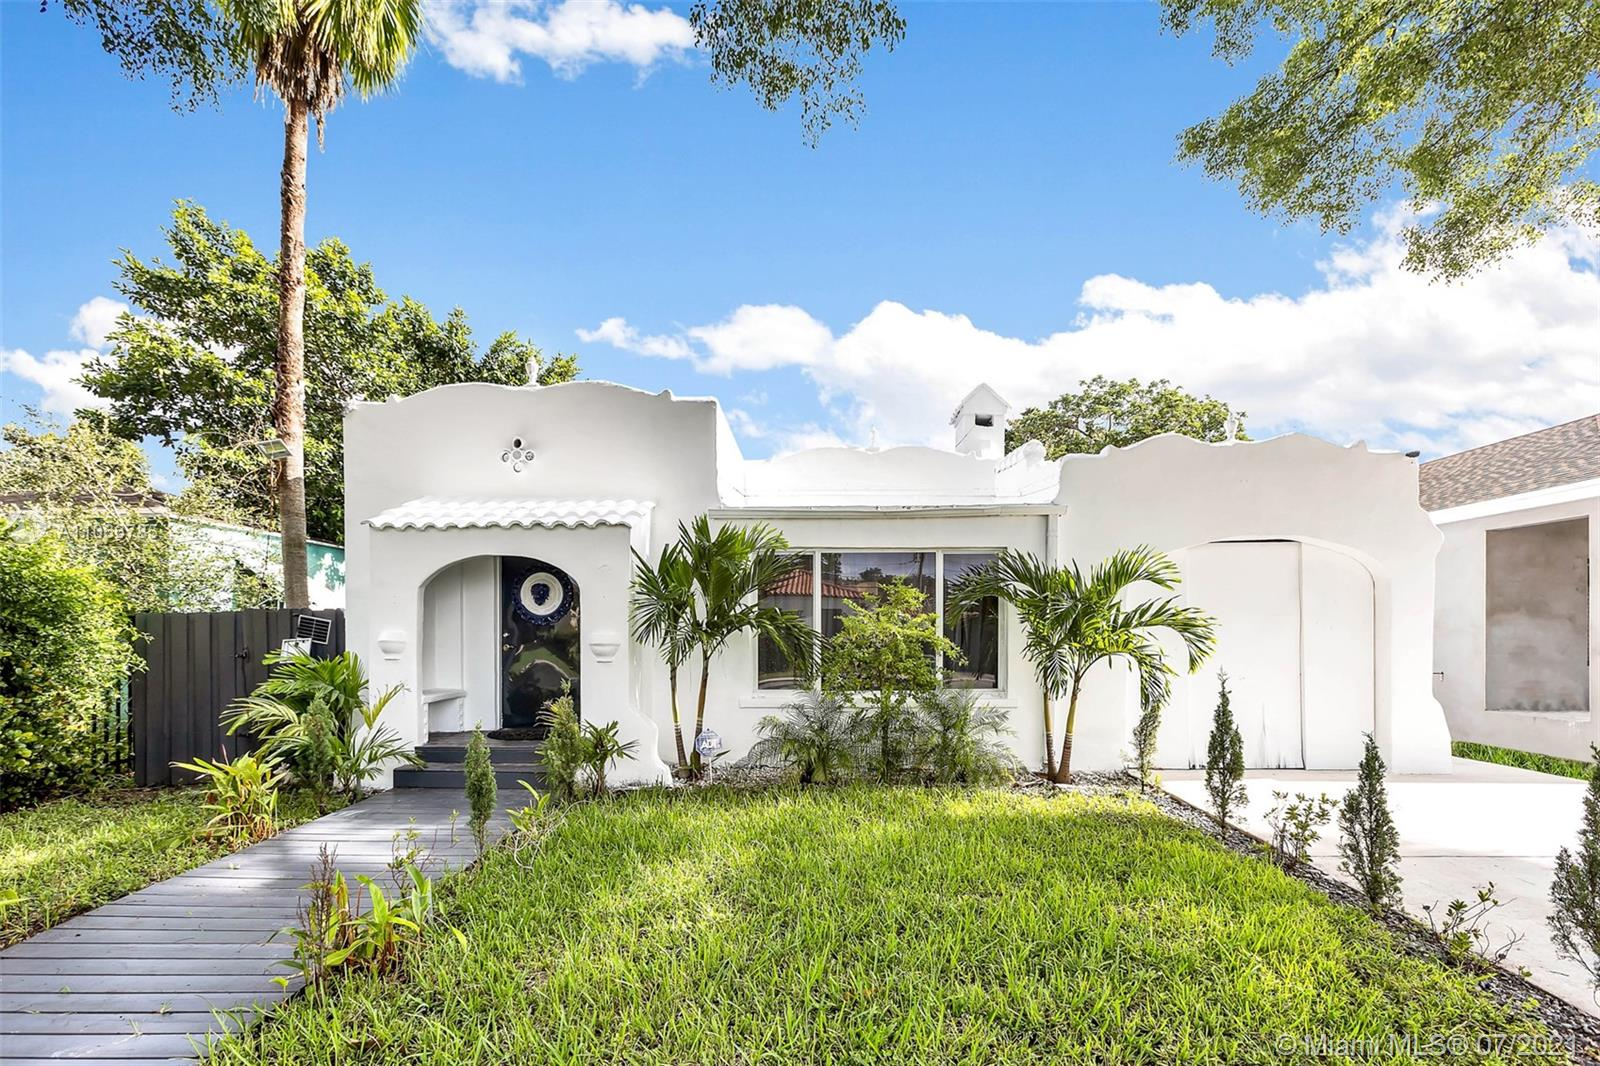 Bay Vista Park - 729 NW 47th St, Miami, FL 33127